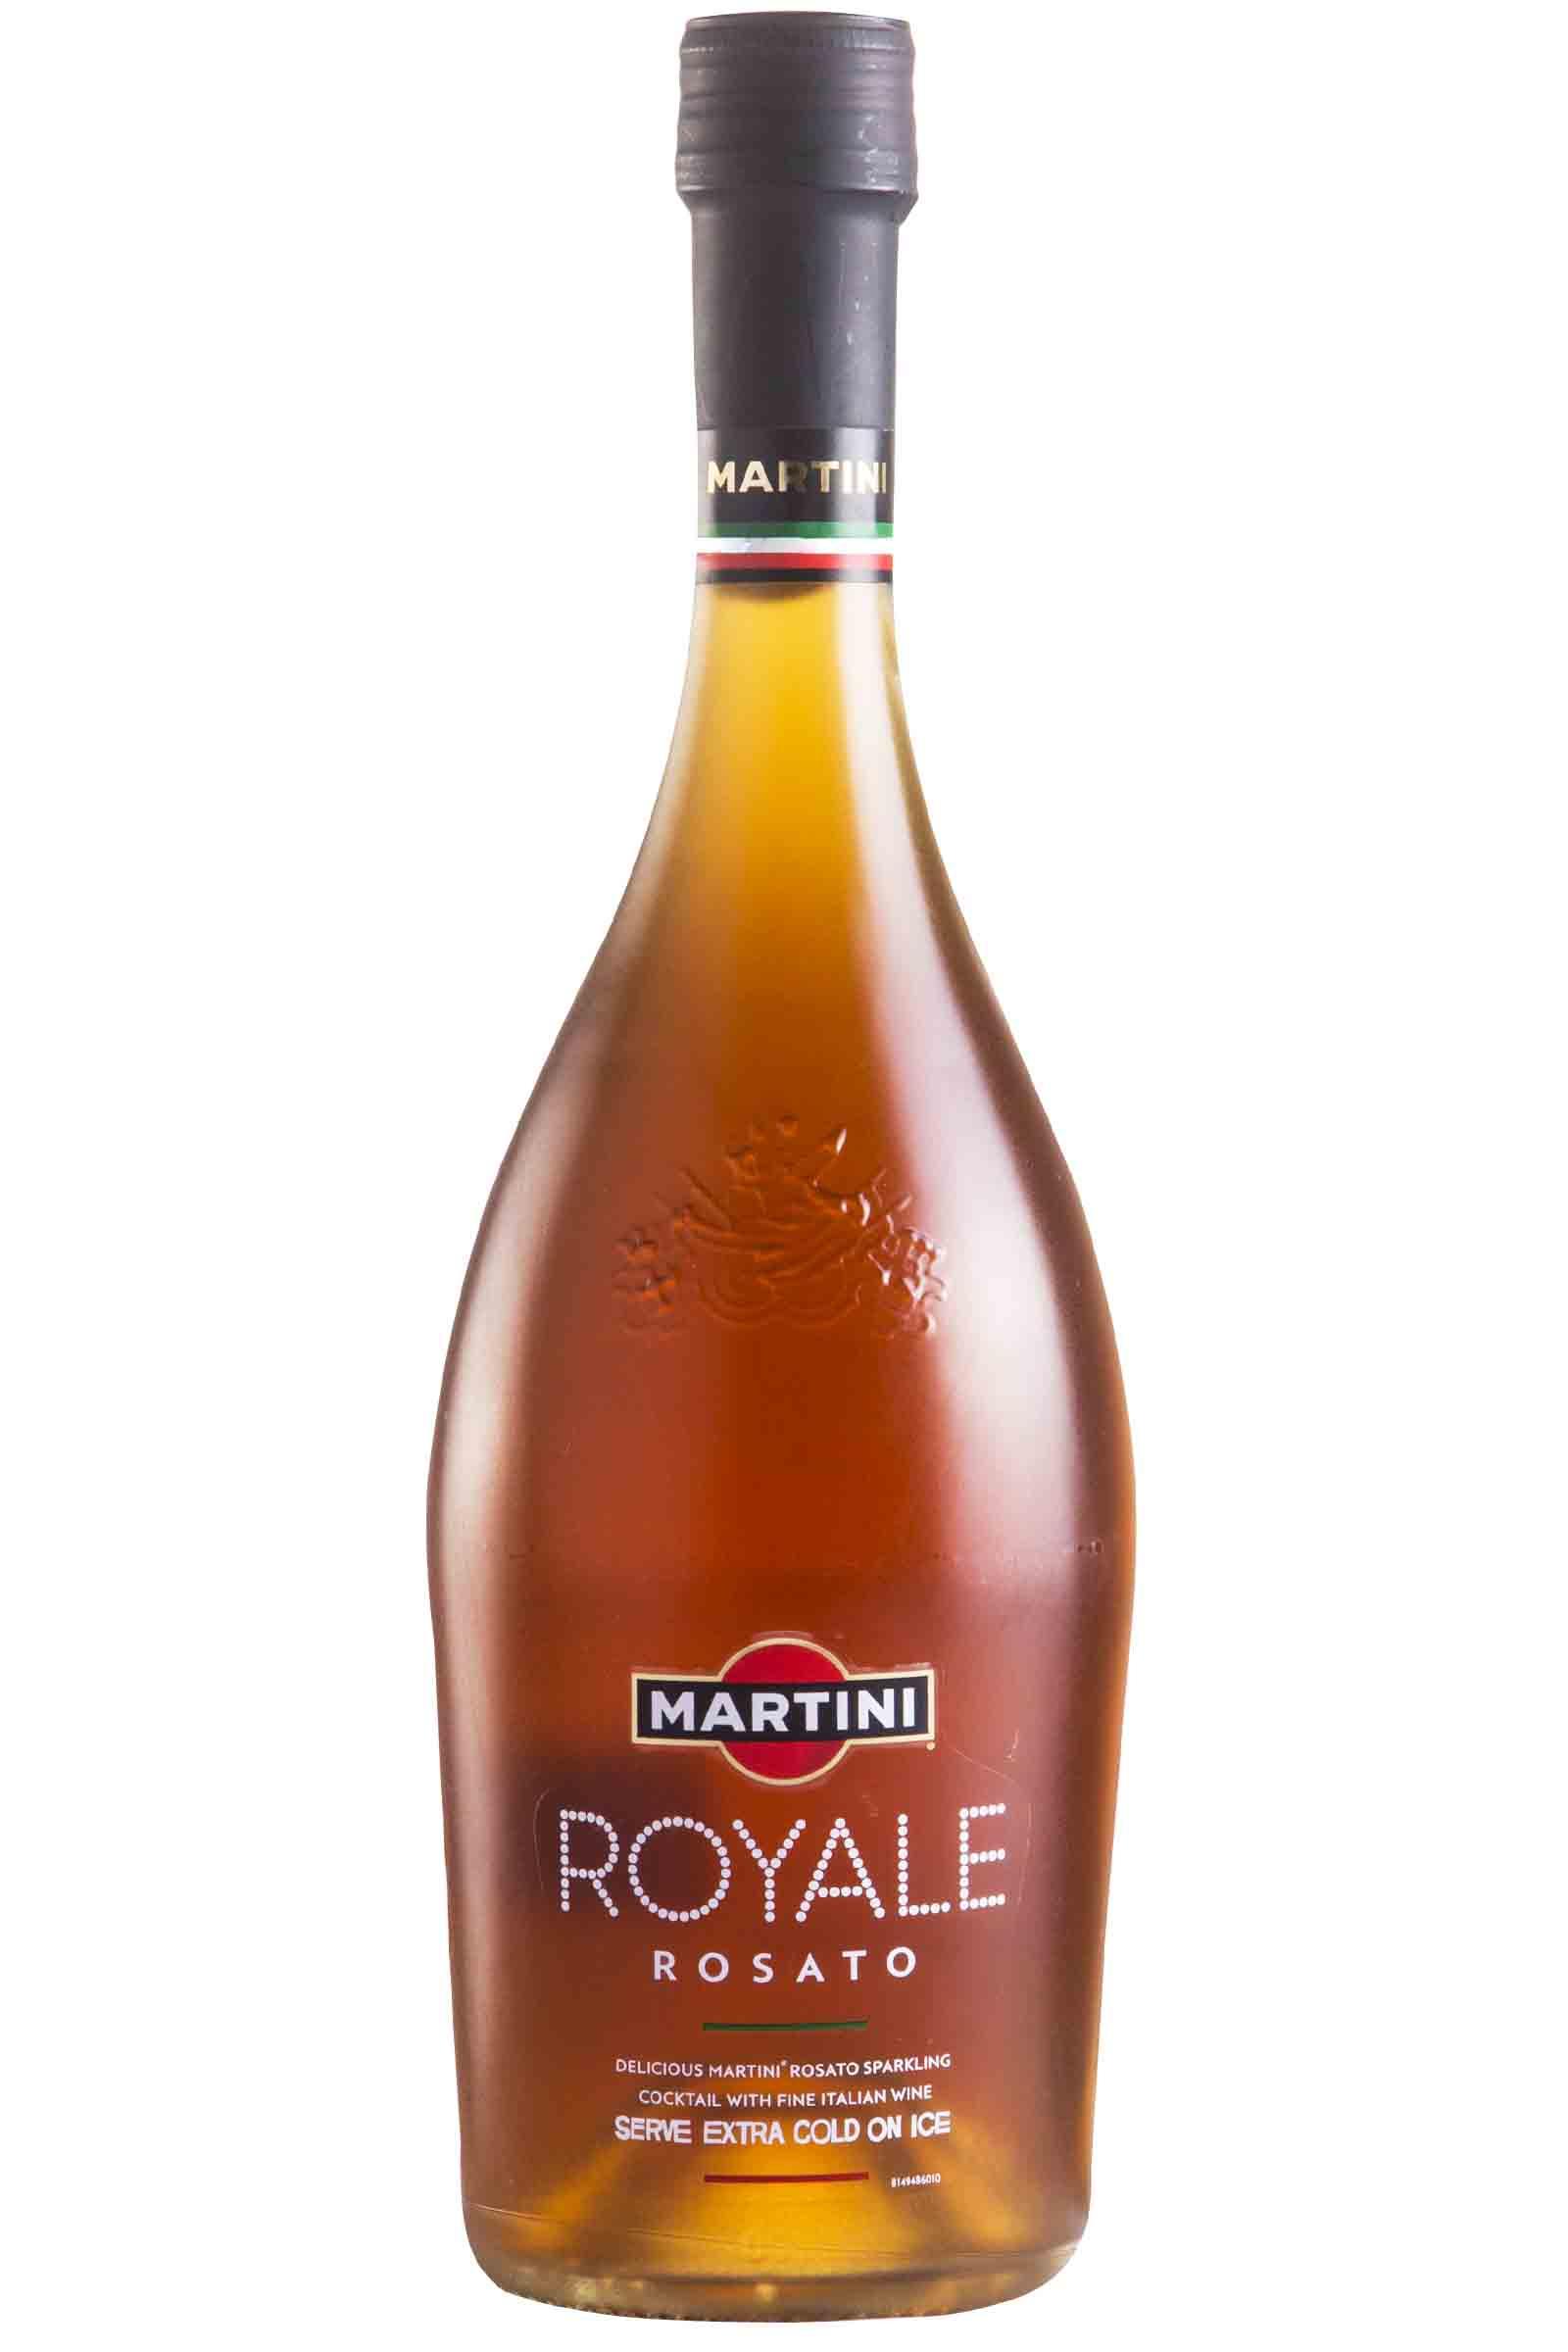 Martini Royale Rosato 750ml